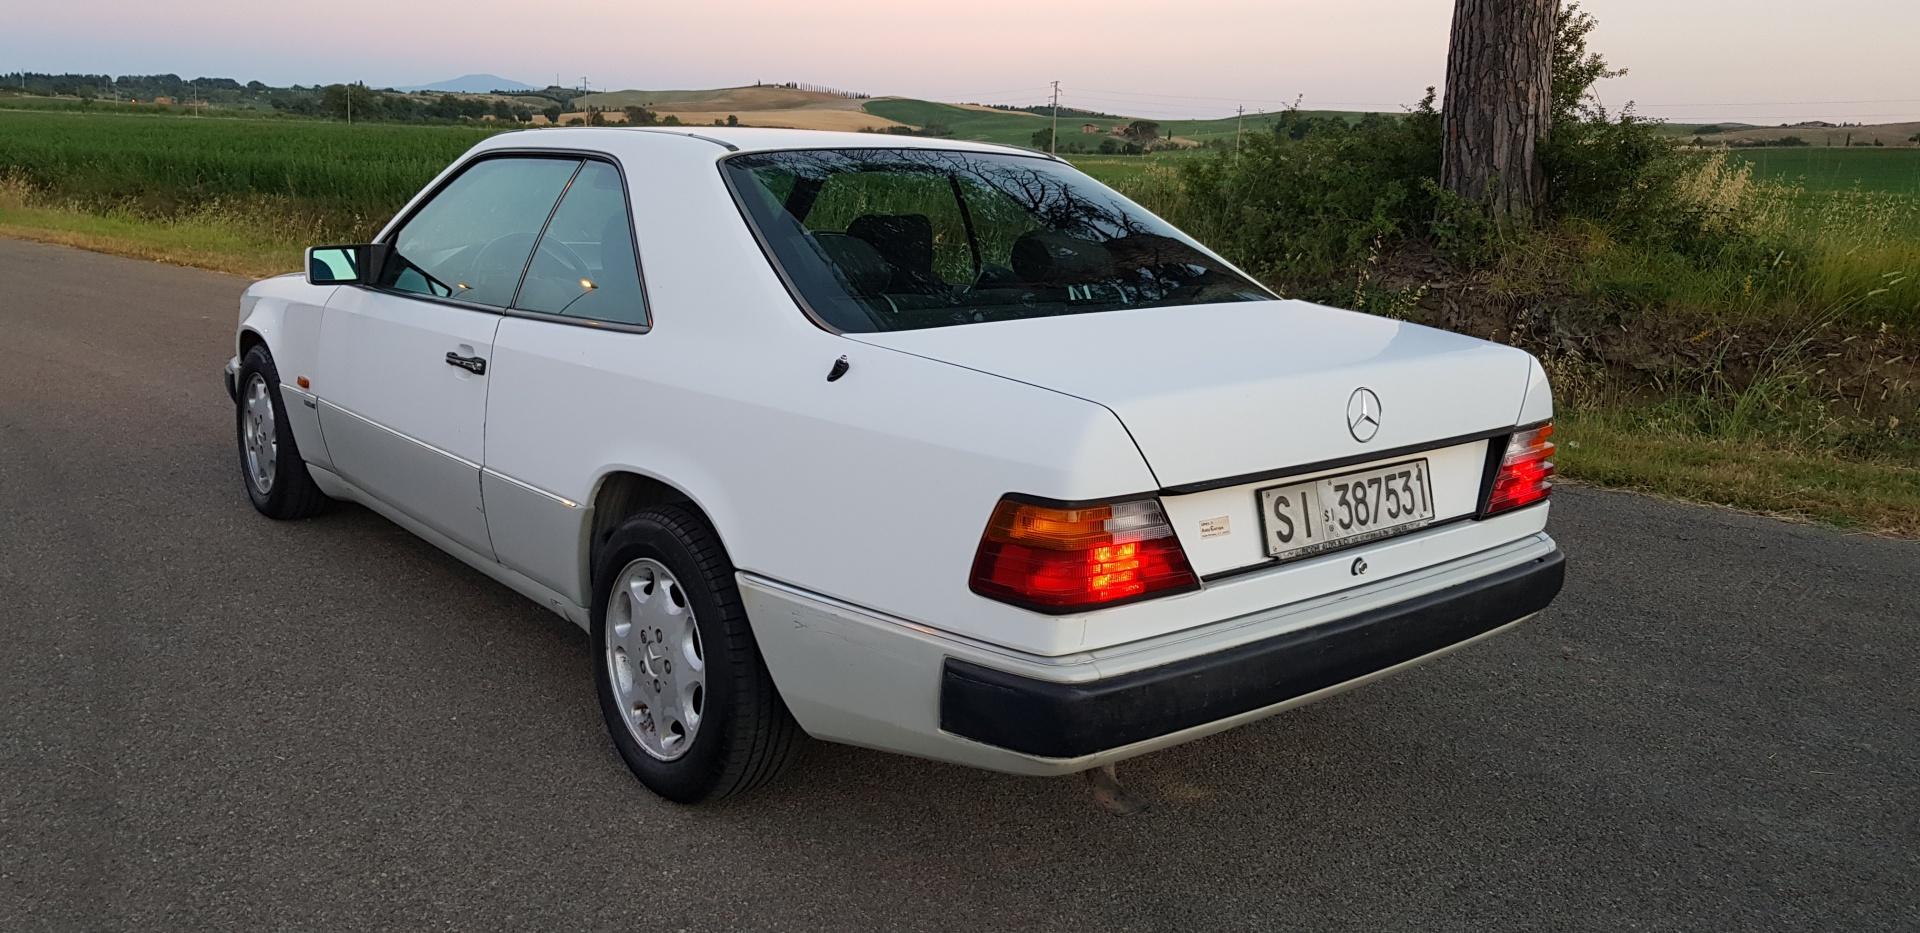 For sale Mercedes CE 200 SPORTLINE